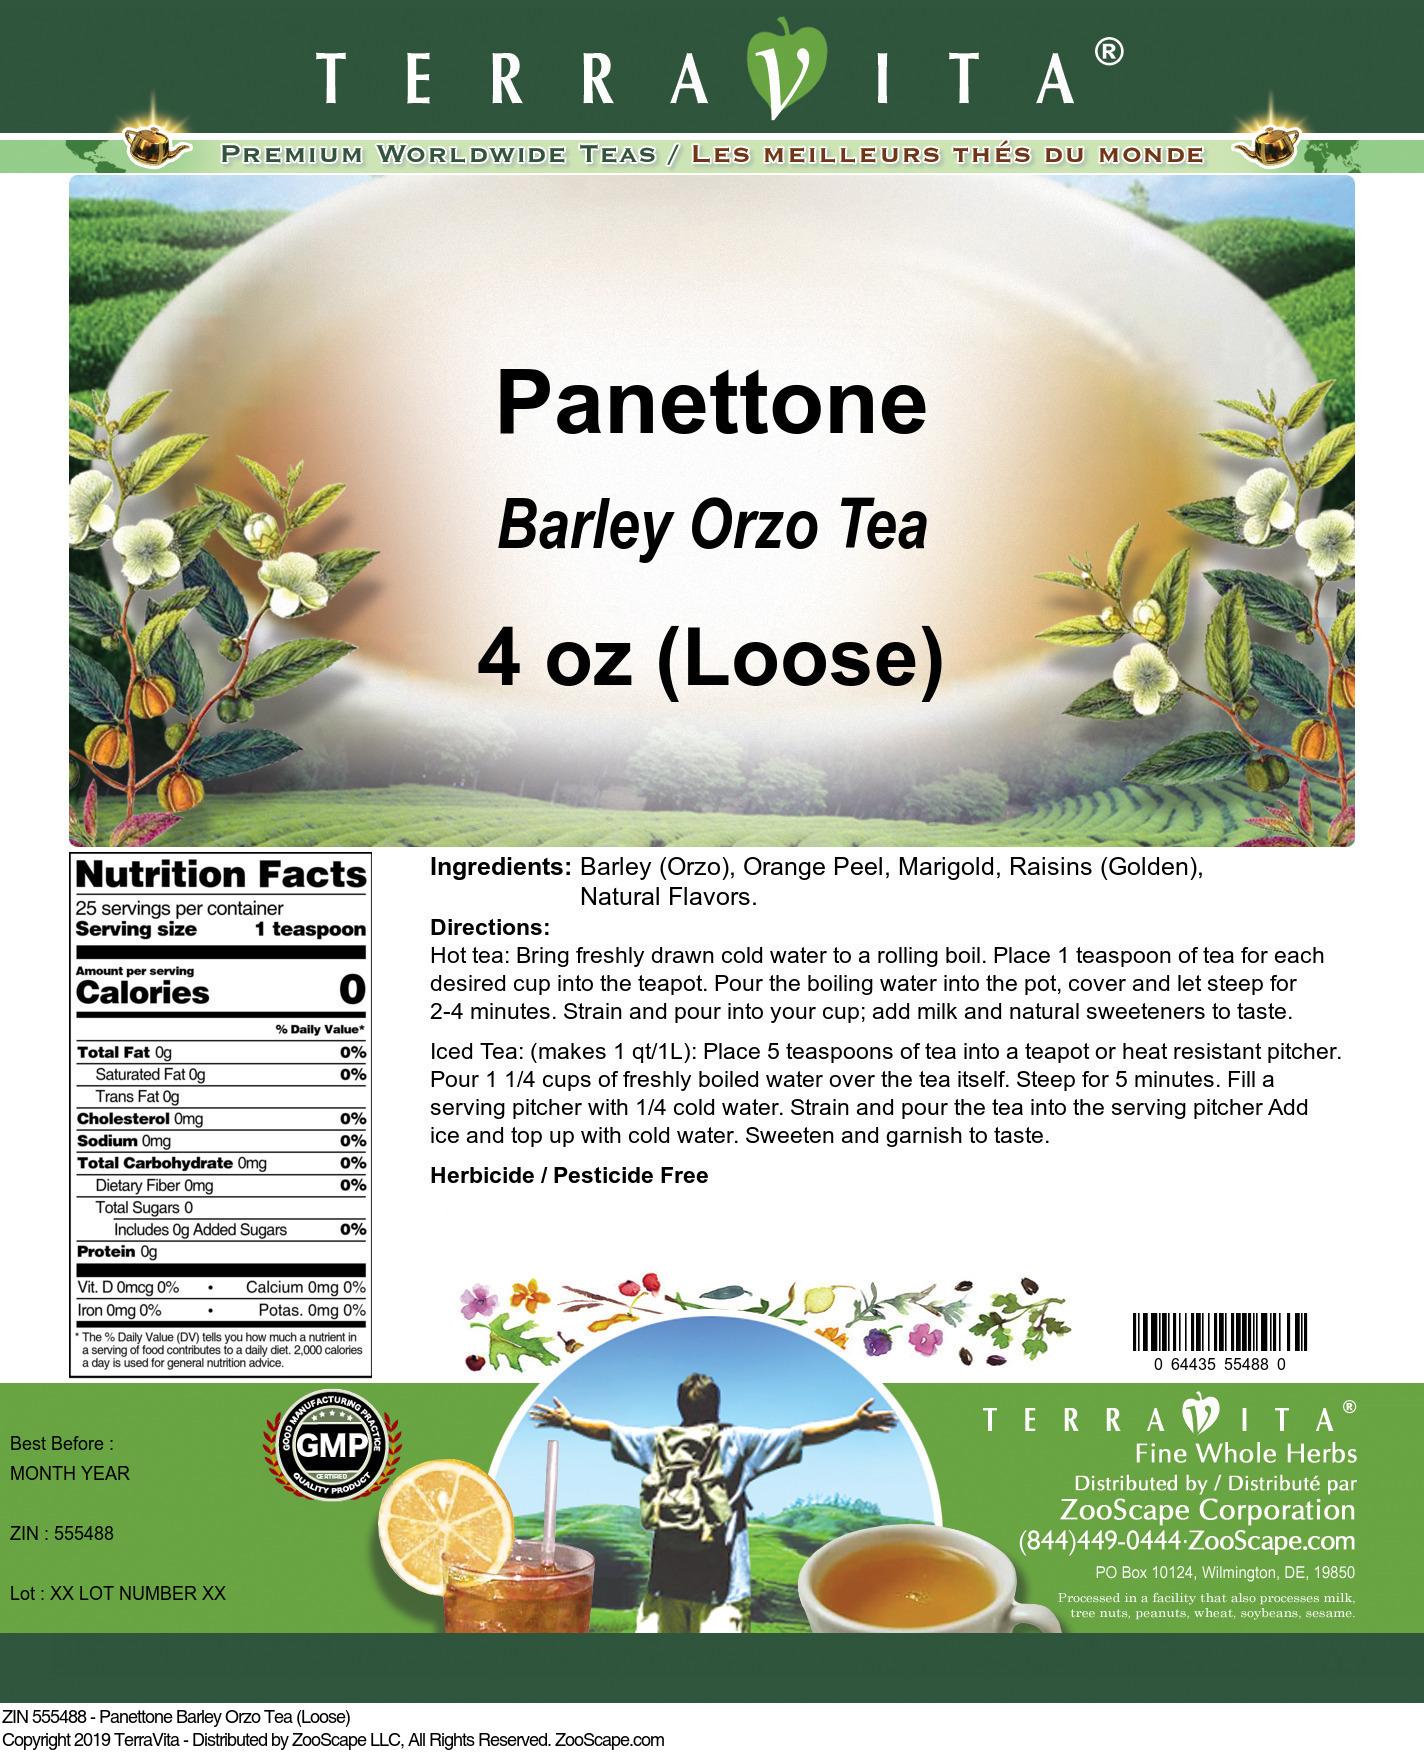 Panettone Barley Orzo